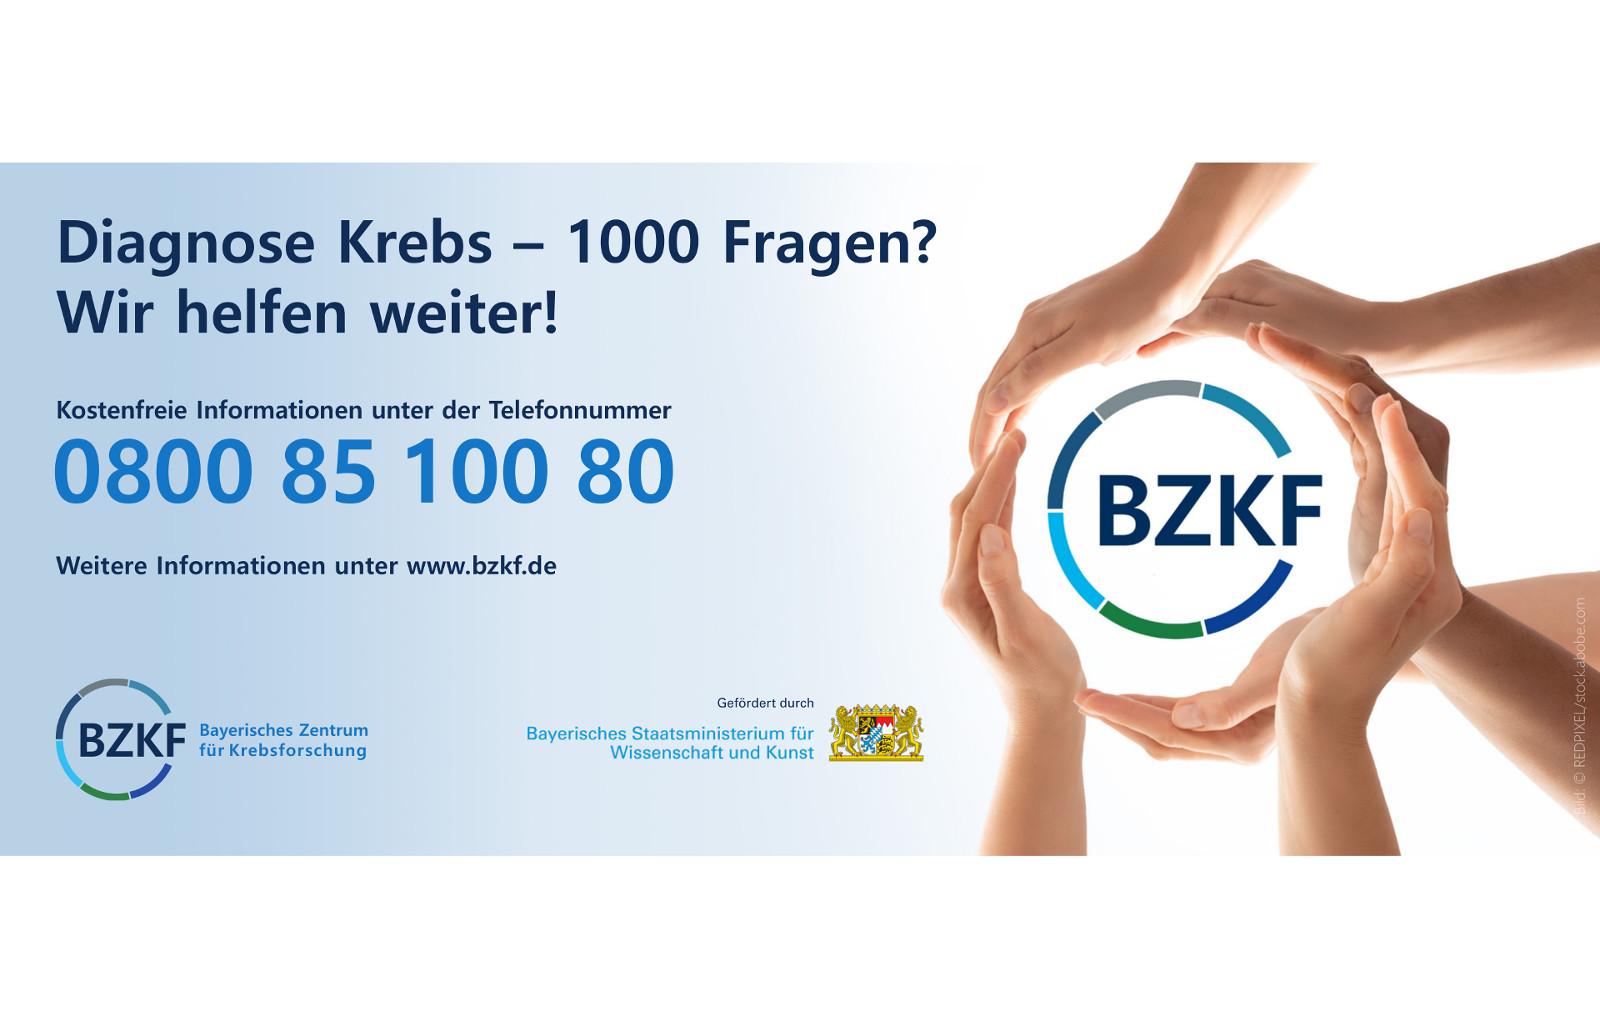 BZKF Buergertelefon 0800 85 100 80